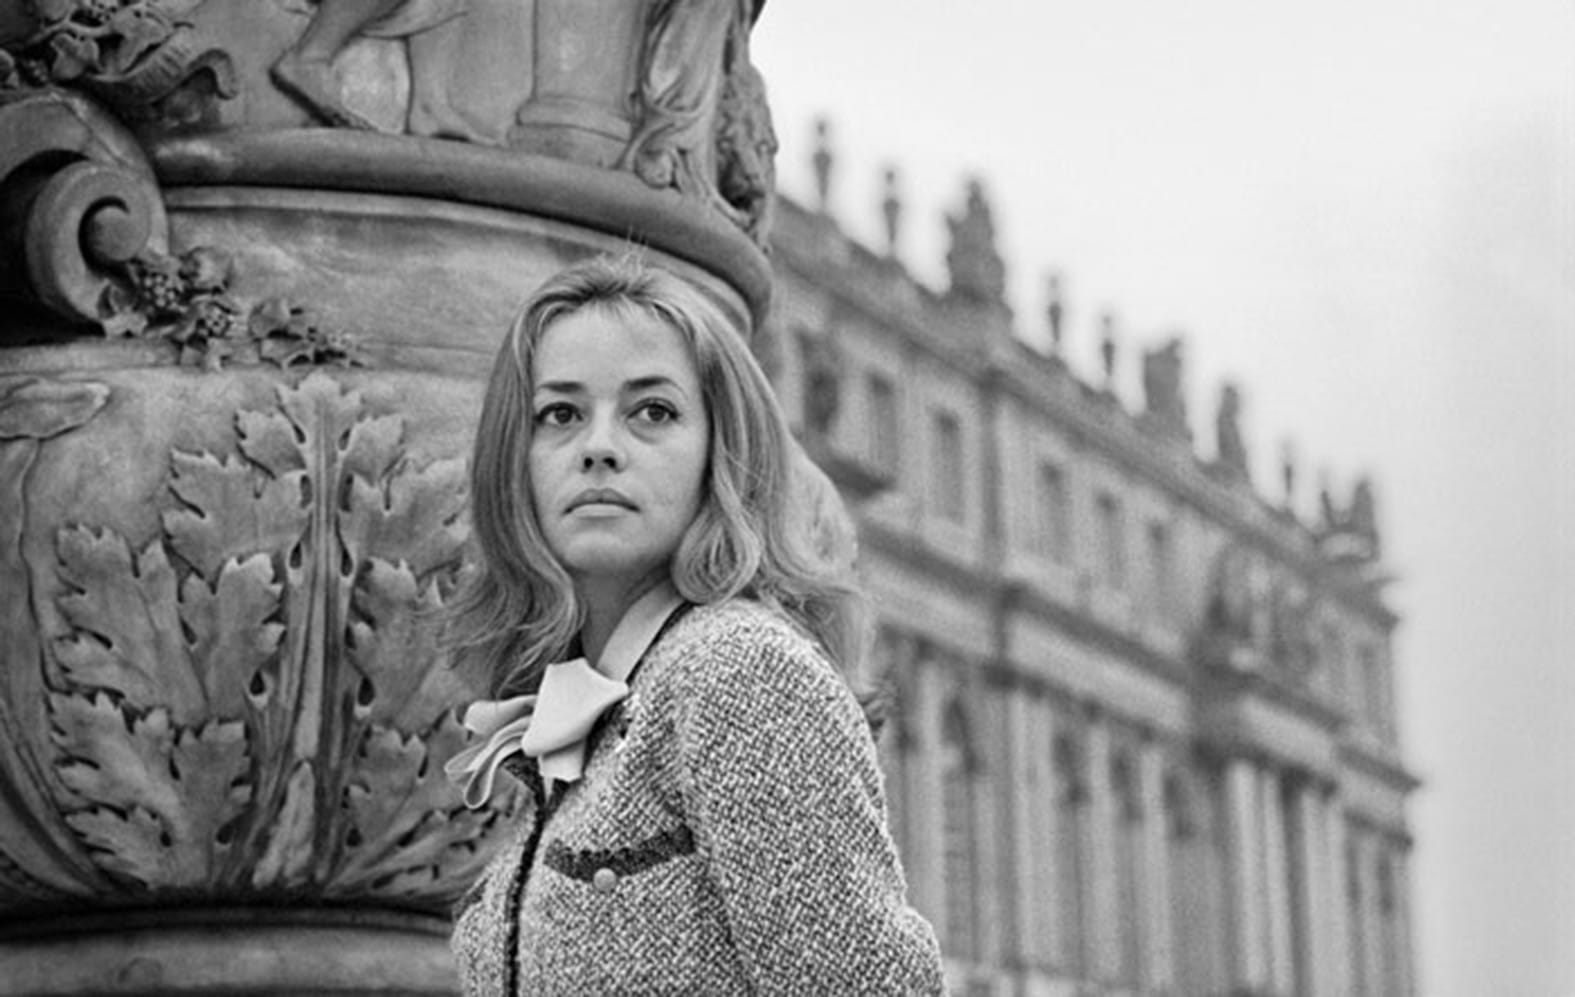 Jeanne-Moreau-bande-a-part-Doumic-ParisBazaar-Ghis